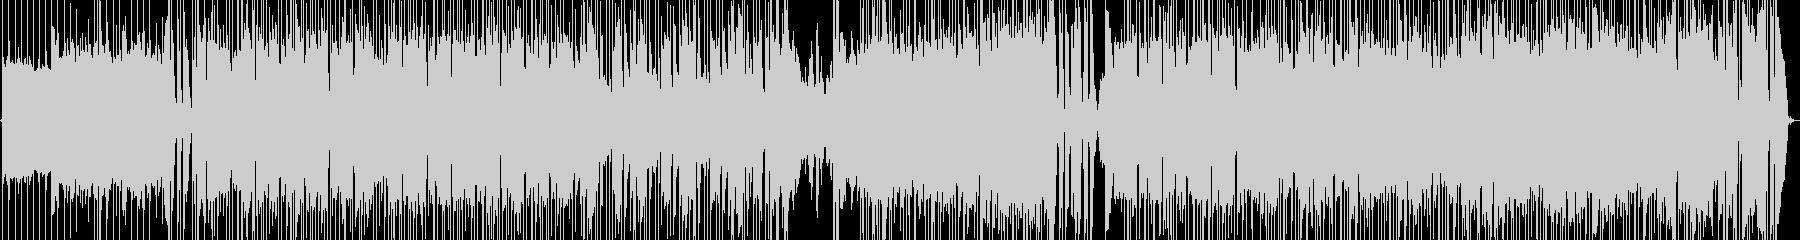 POPセンチメンタルなインスト曲の未再生の波形